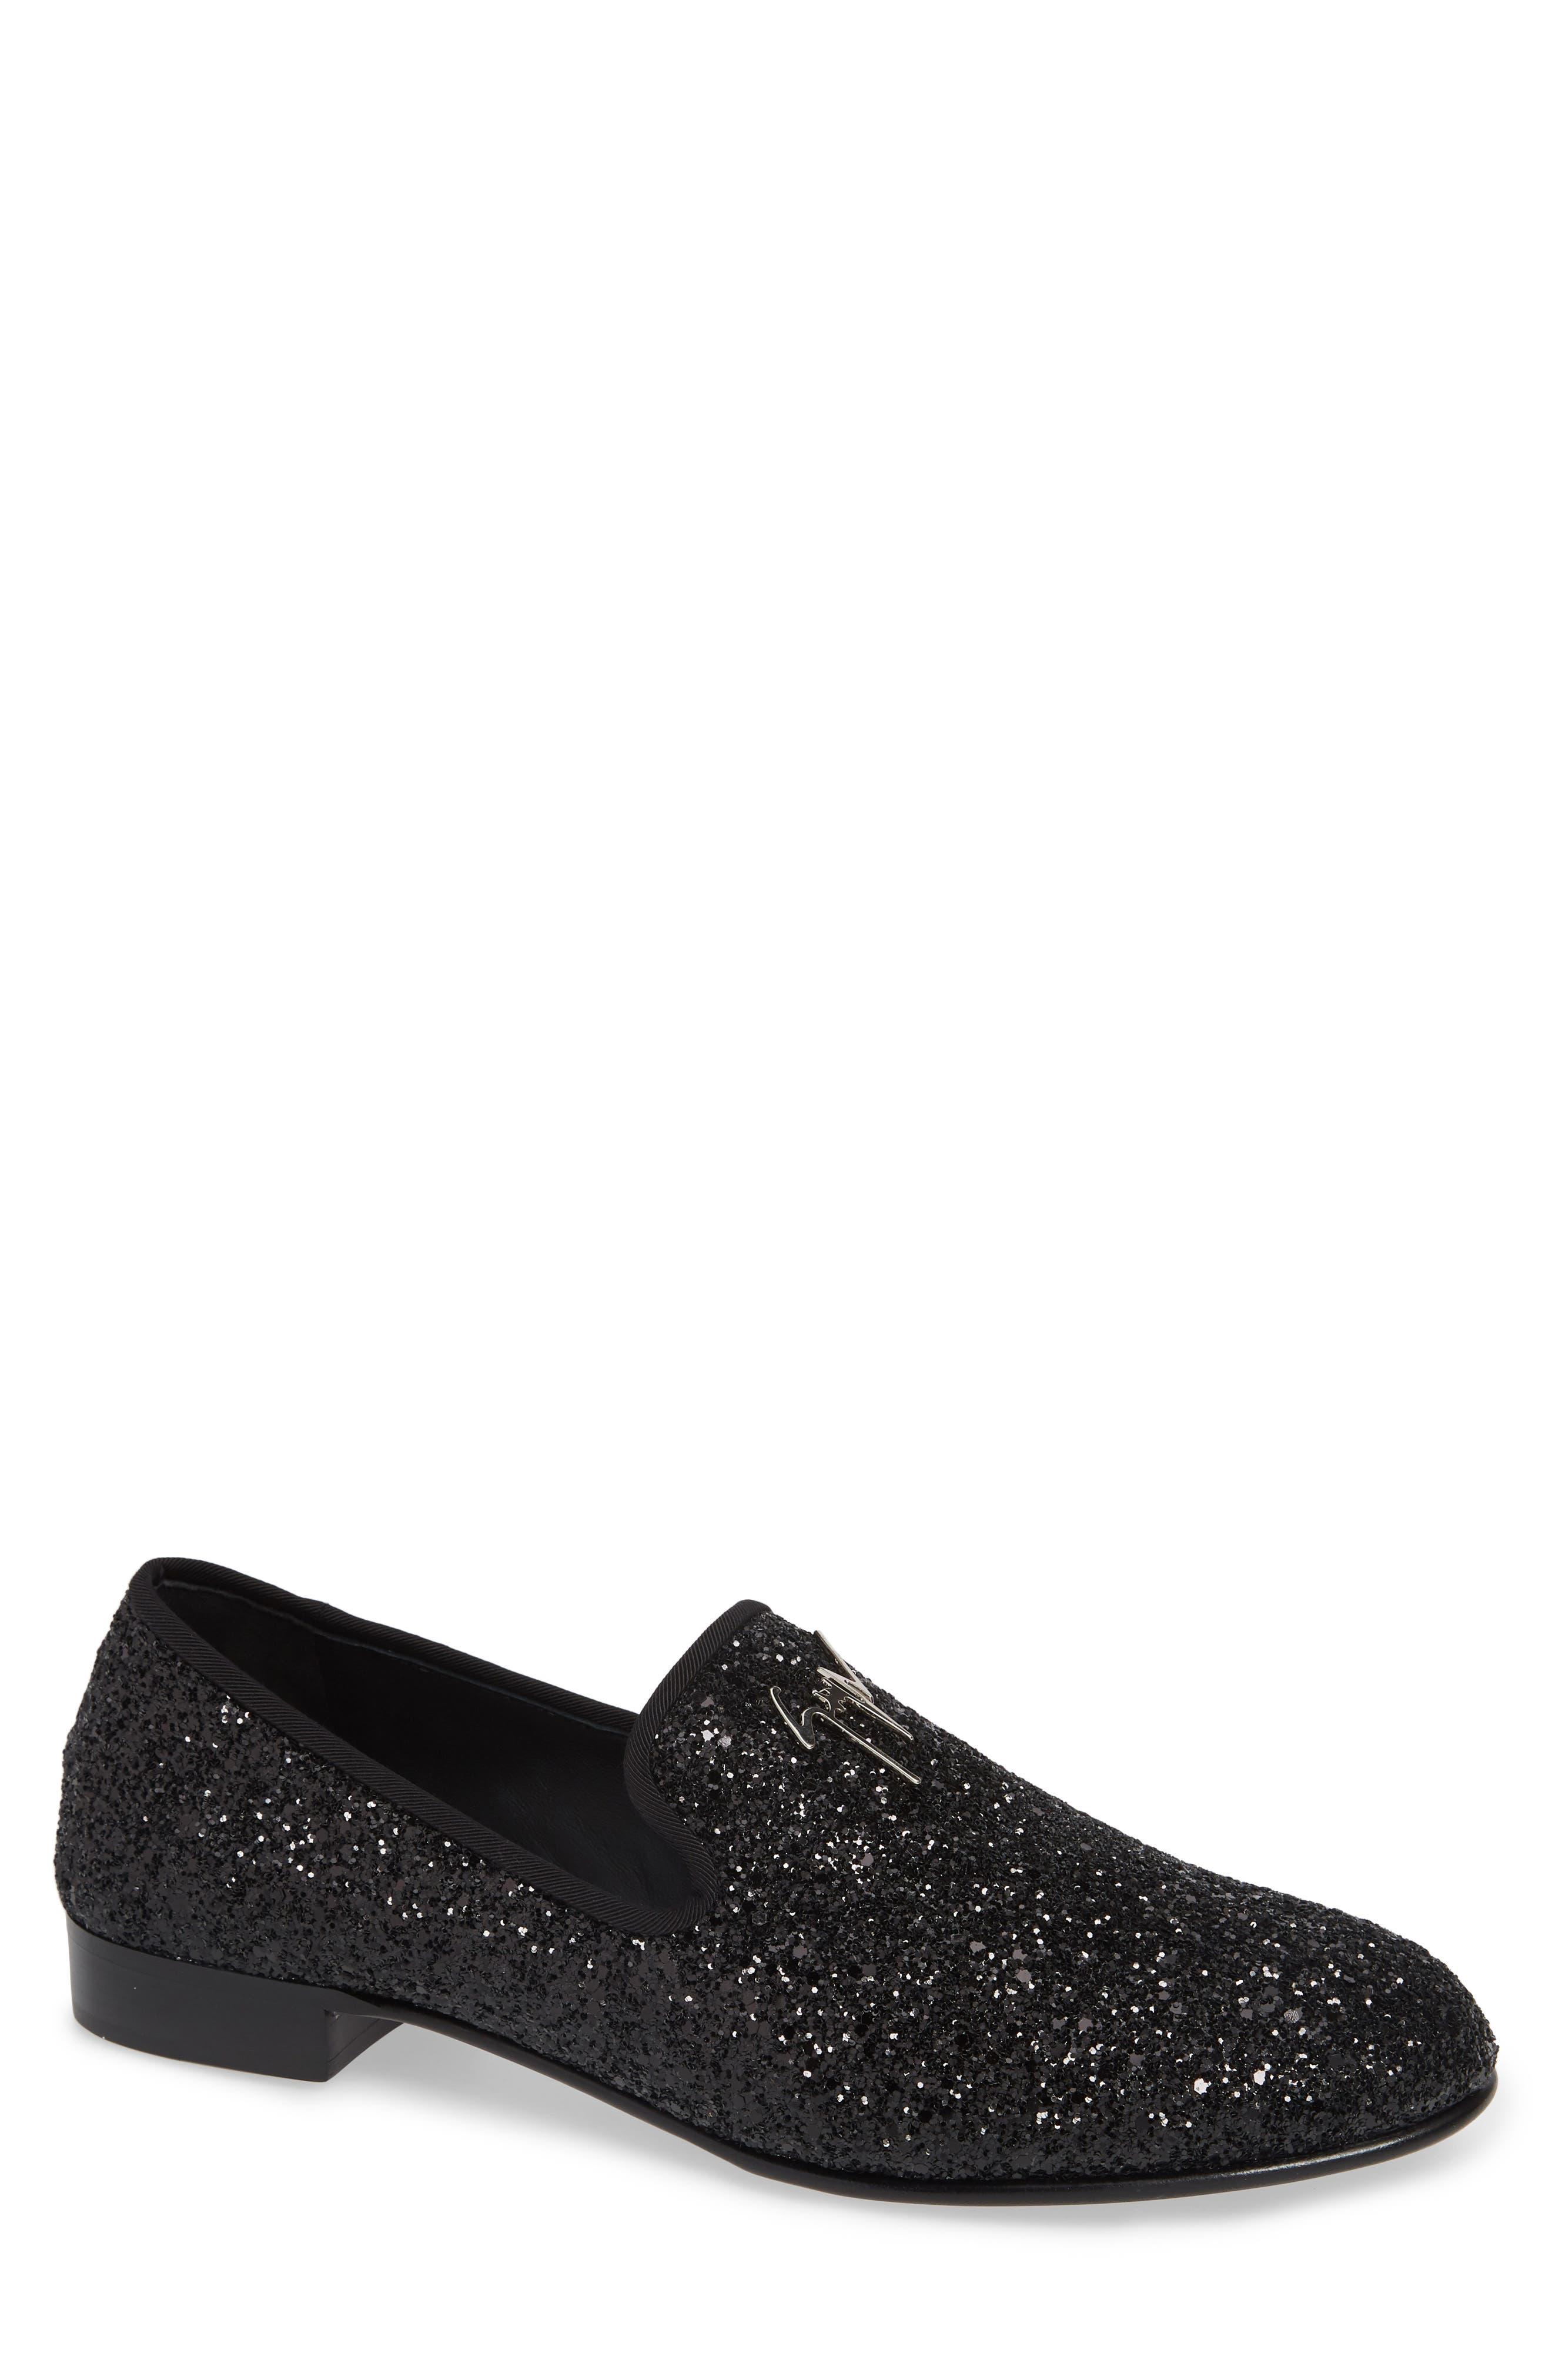 Giuseppe Sandals Shoes Zanotti amp; Nordstrom Sneakers Women's qwArHZaq